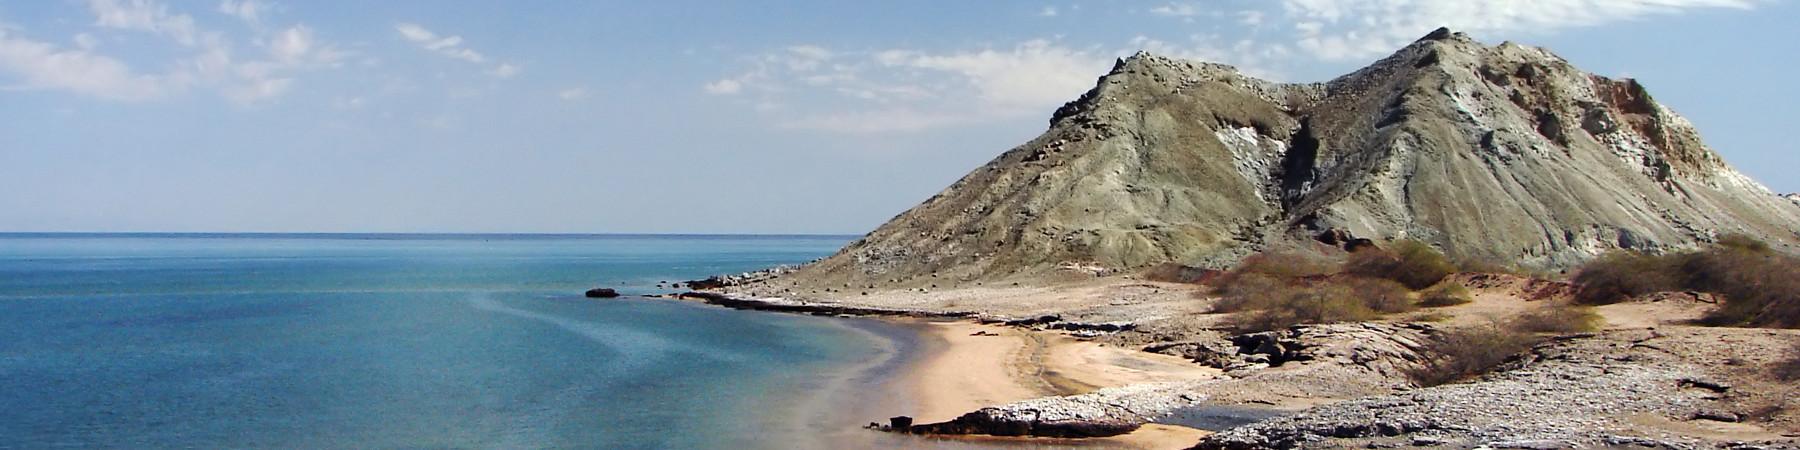 Photo Credit http://wikitravel.org/en/Kish_Island